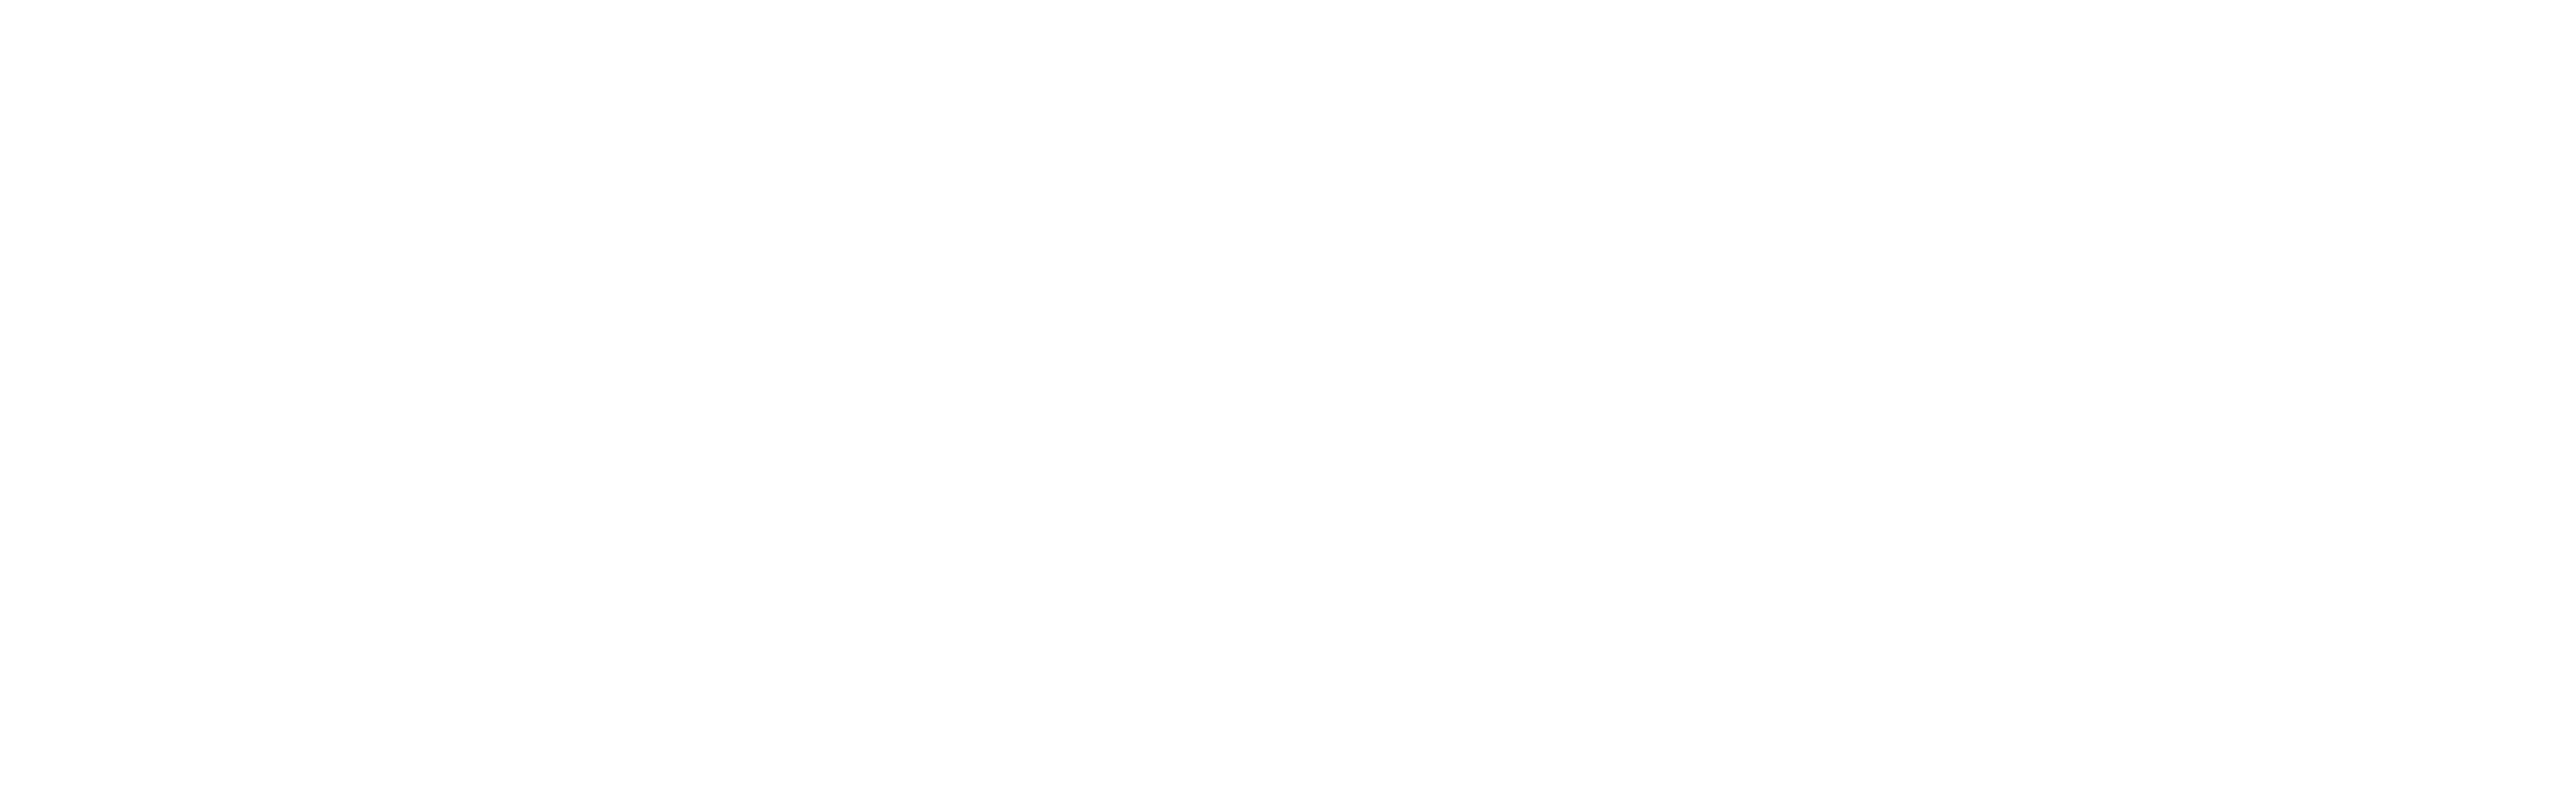 File:Logo macron.png - Wikimedia Commons